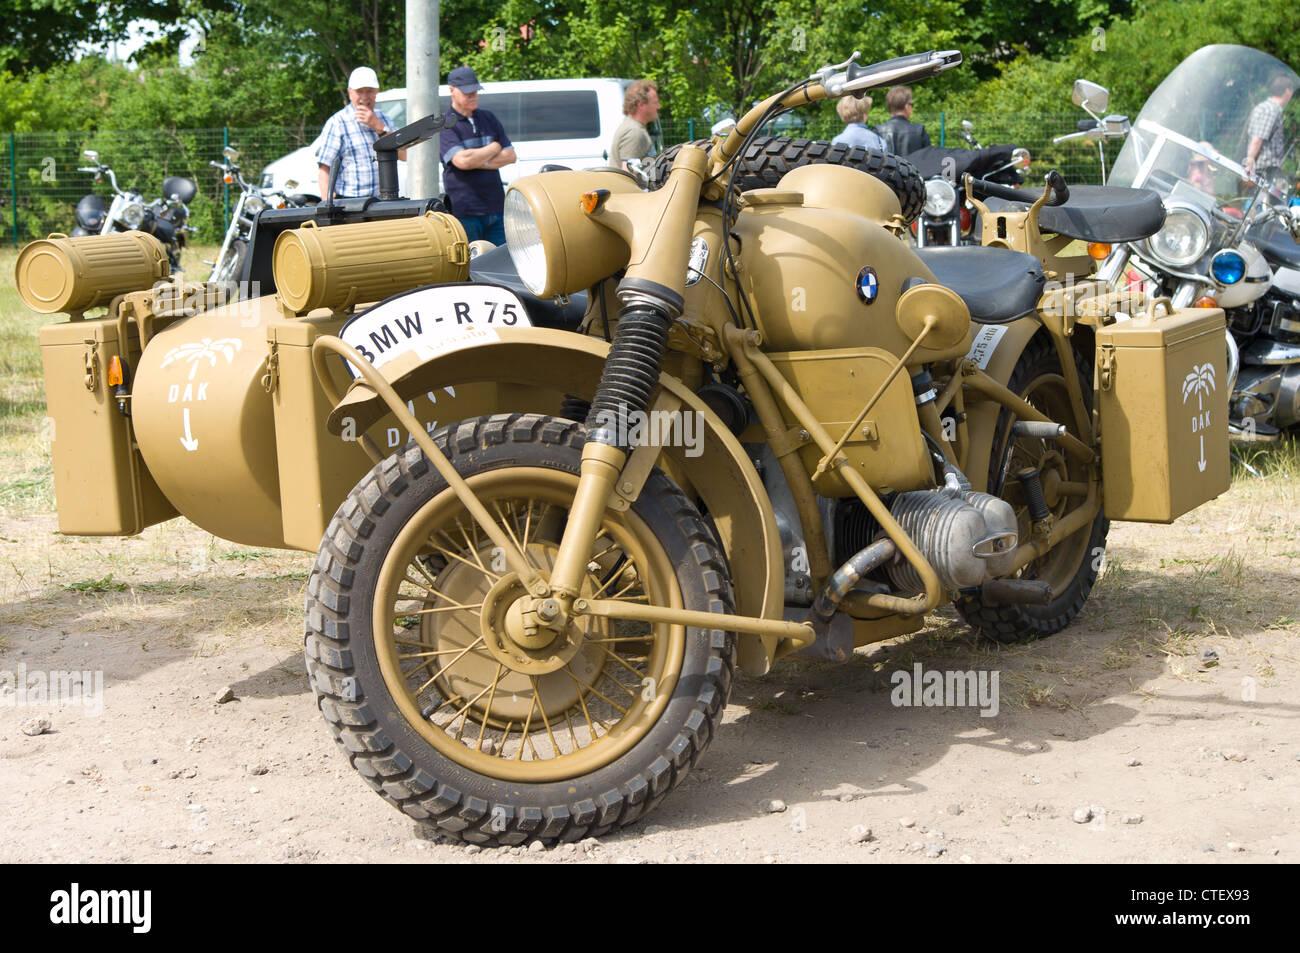 military motorbike stock photos & military motorbike stock images